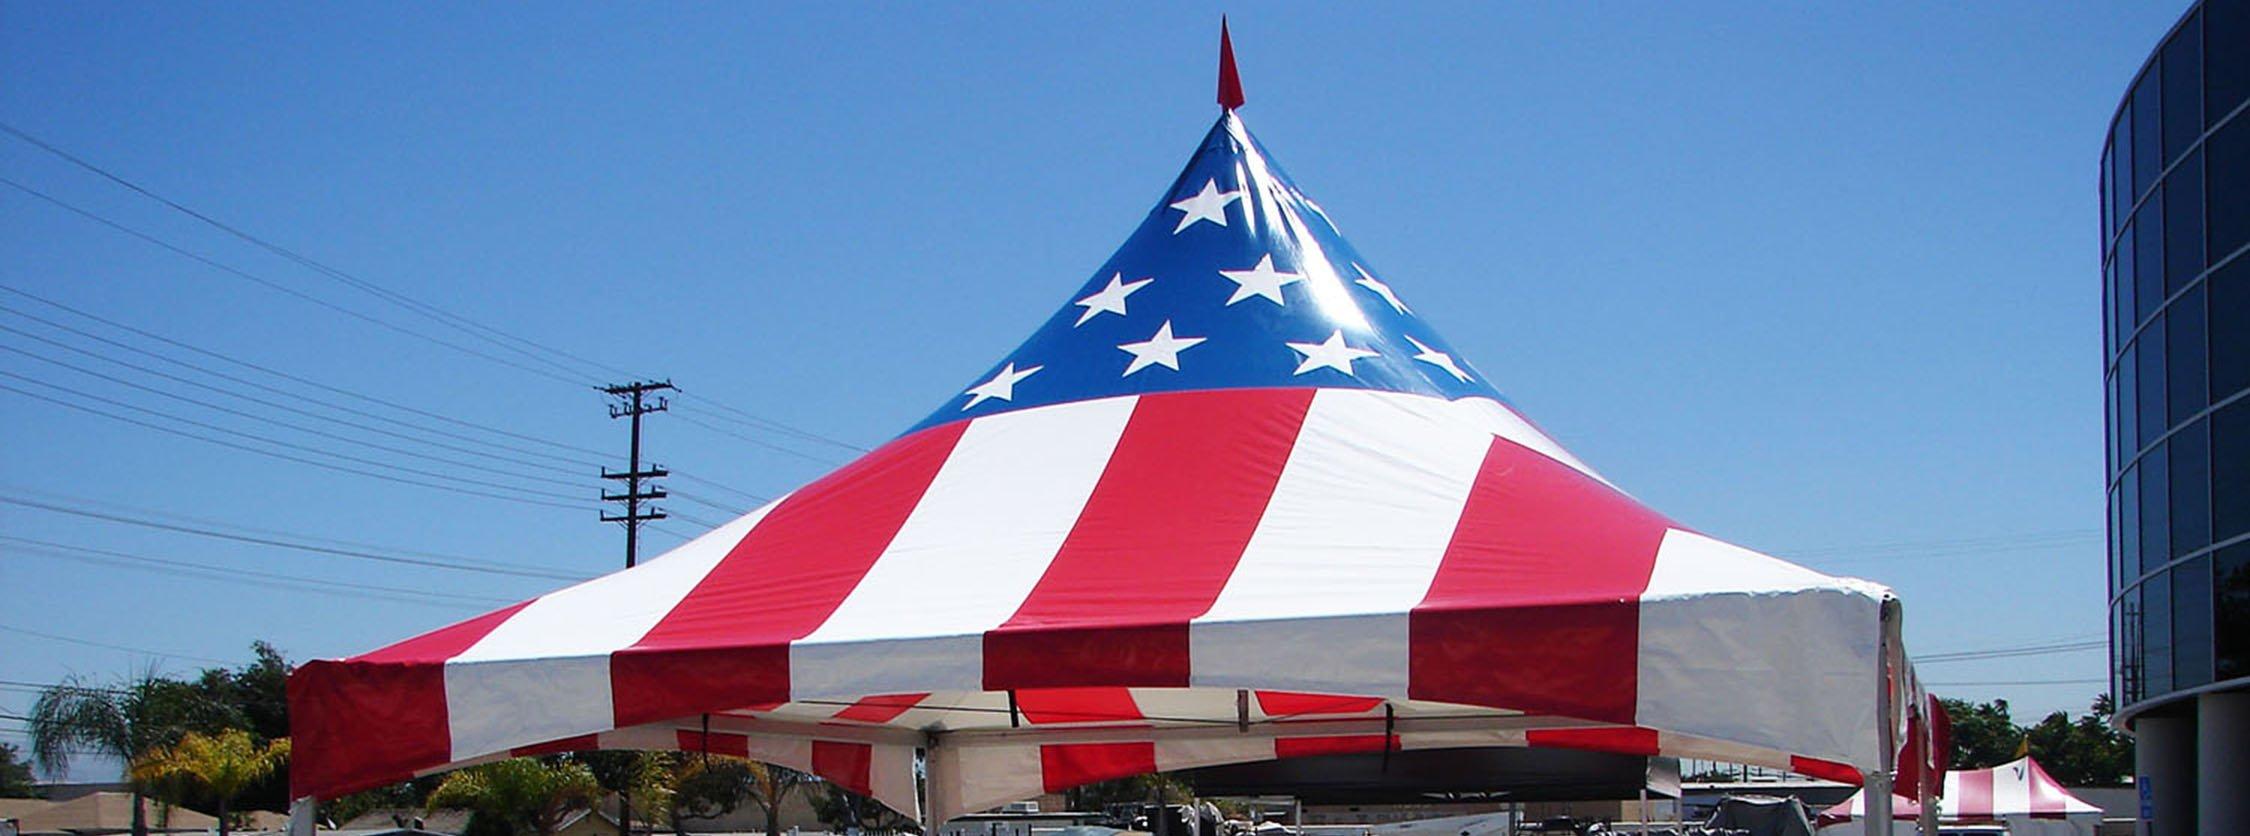 20x20-american-flag-high-peak-tent-header.jpg